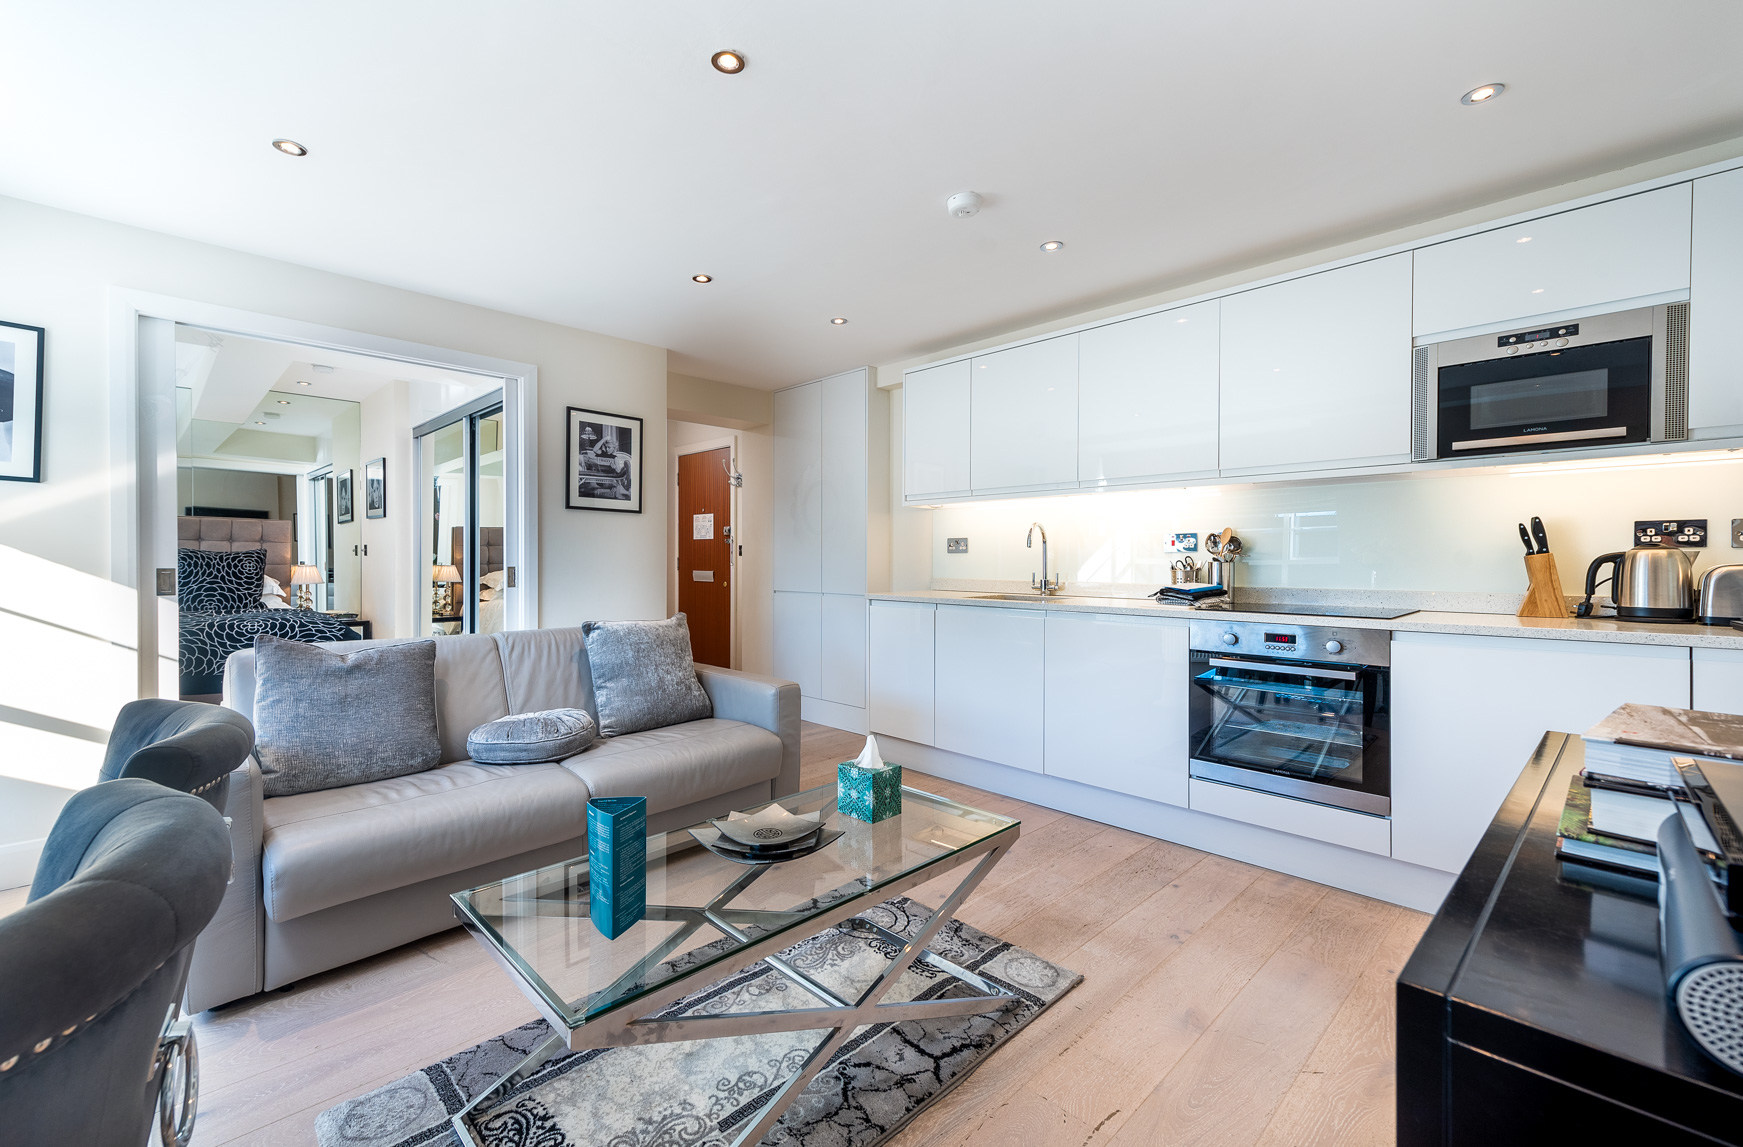 Kitchen at Nell Gwynn House Accommodation, Chelsea, London